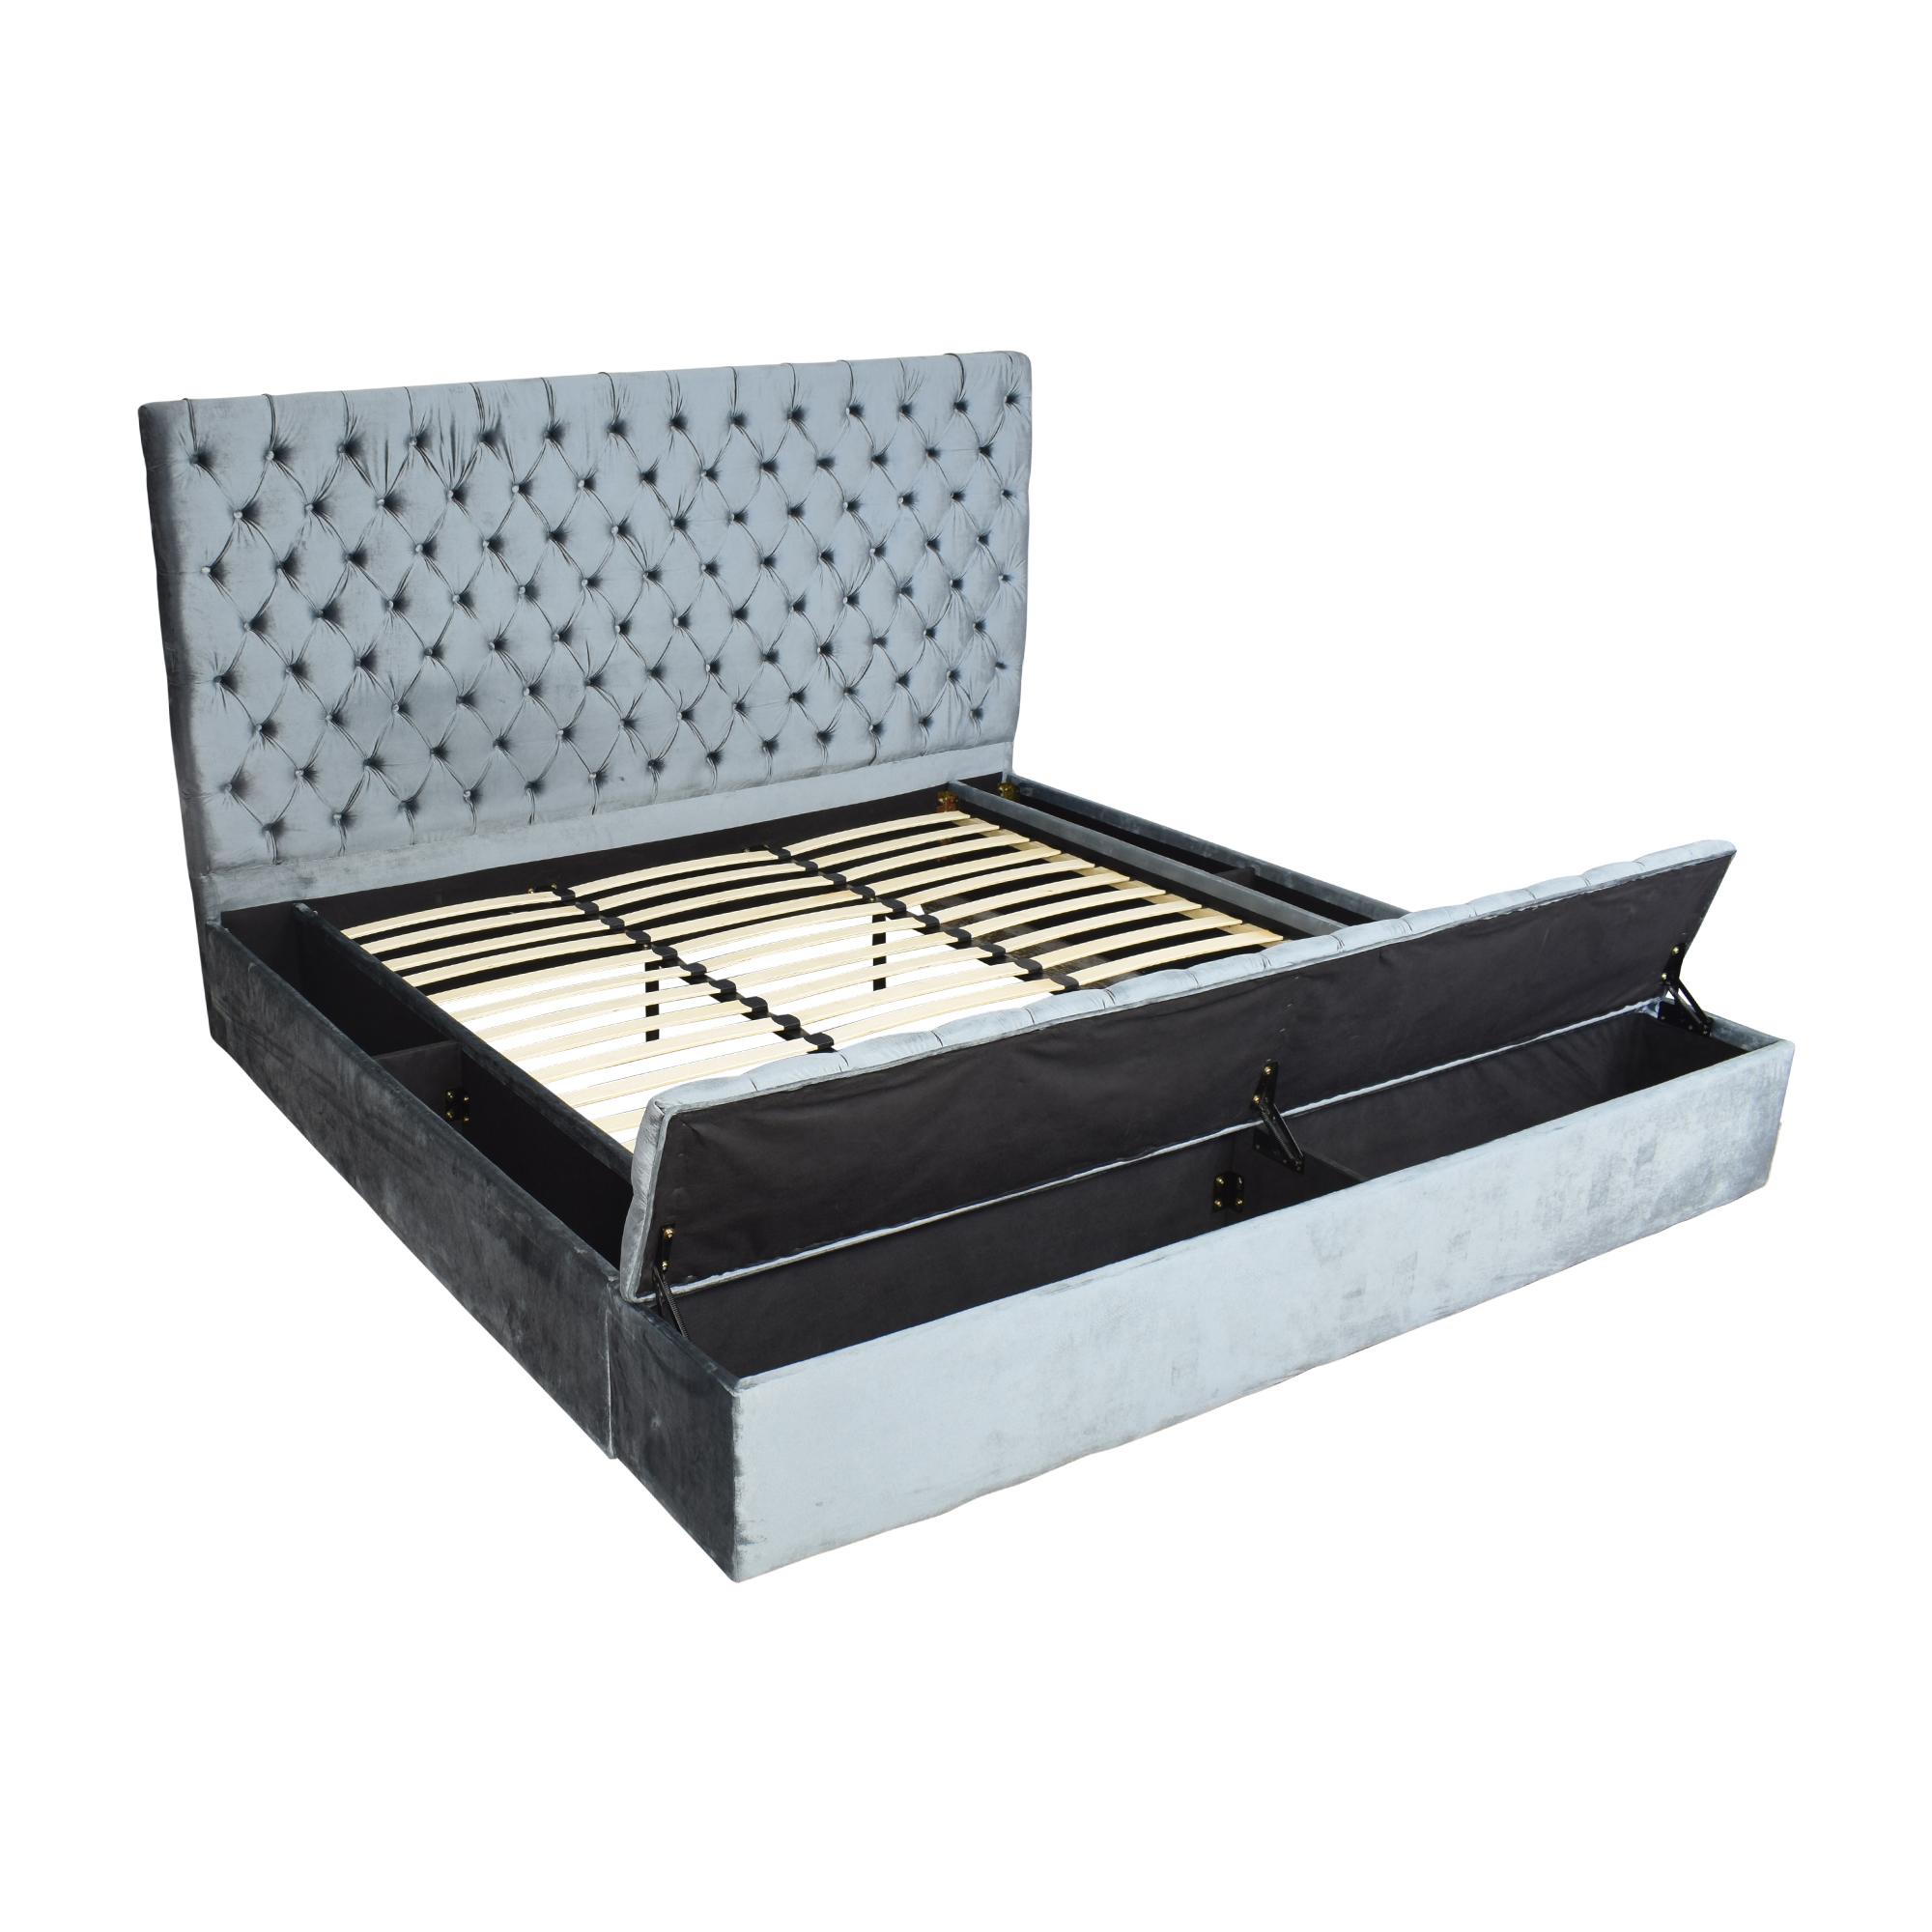 Meridian Furniture Meridian Bliss King Storage Bed dimensions